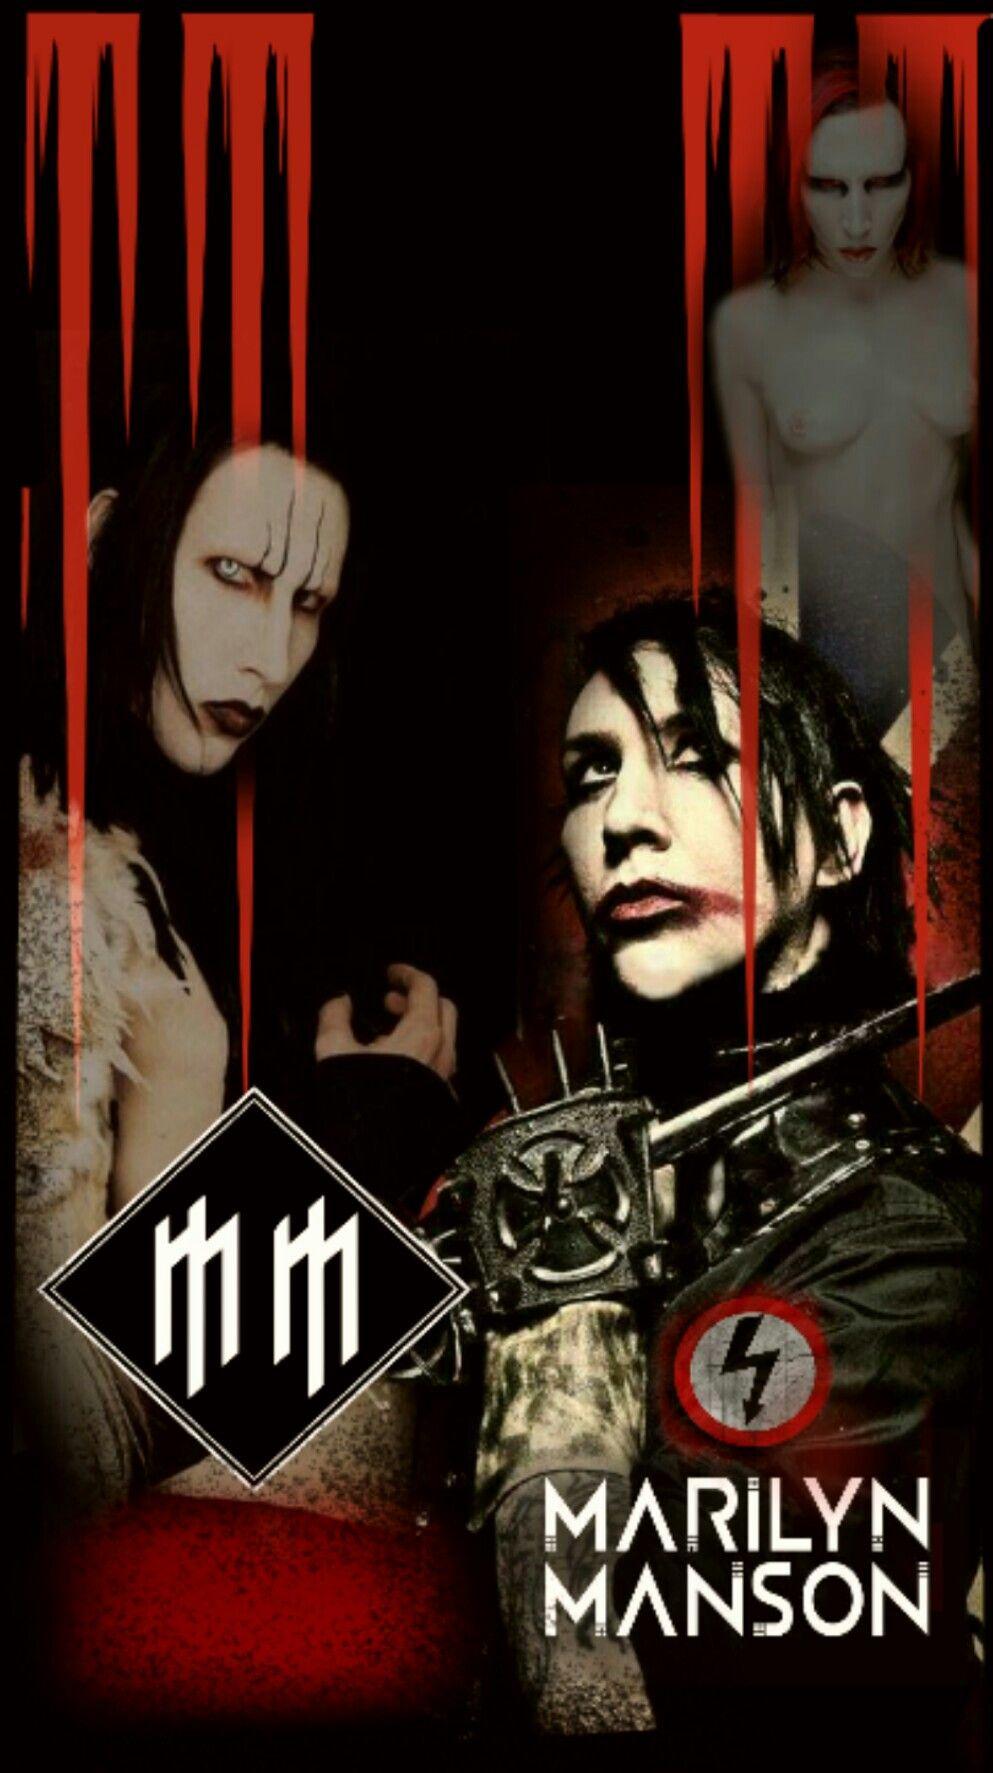 Wallpaper Marilyn Manson Marylin Manson Marilyn